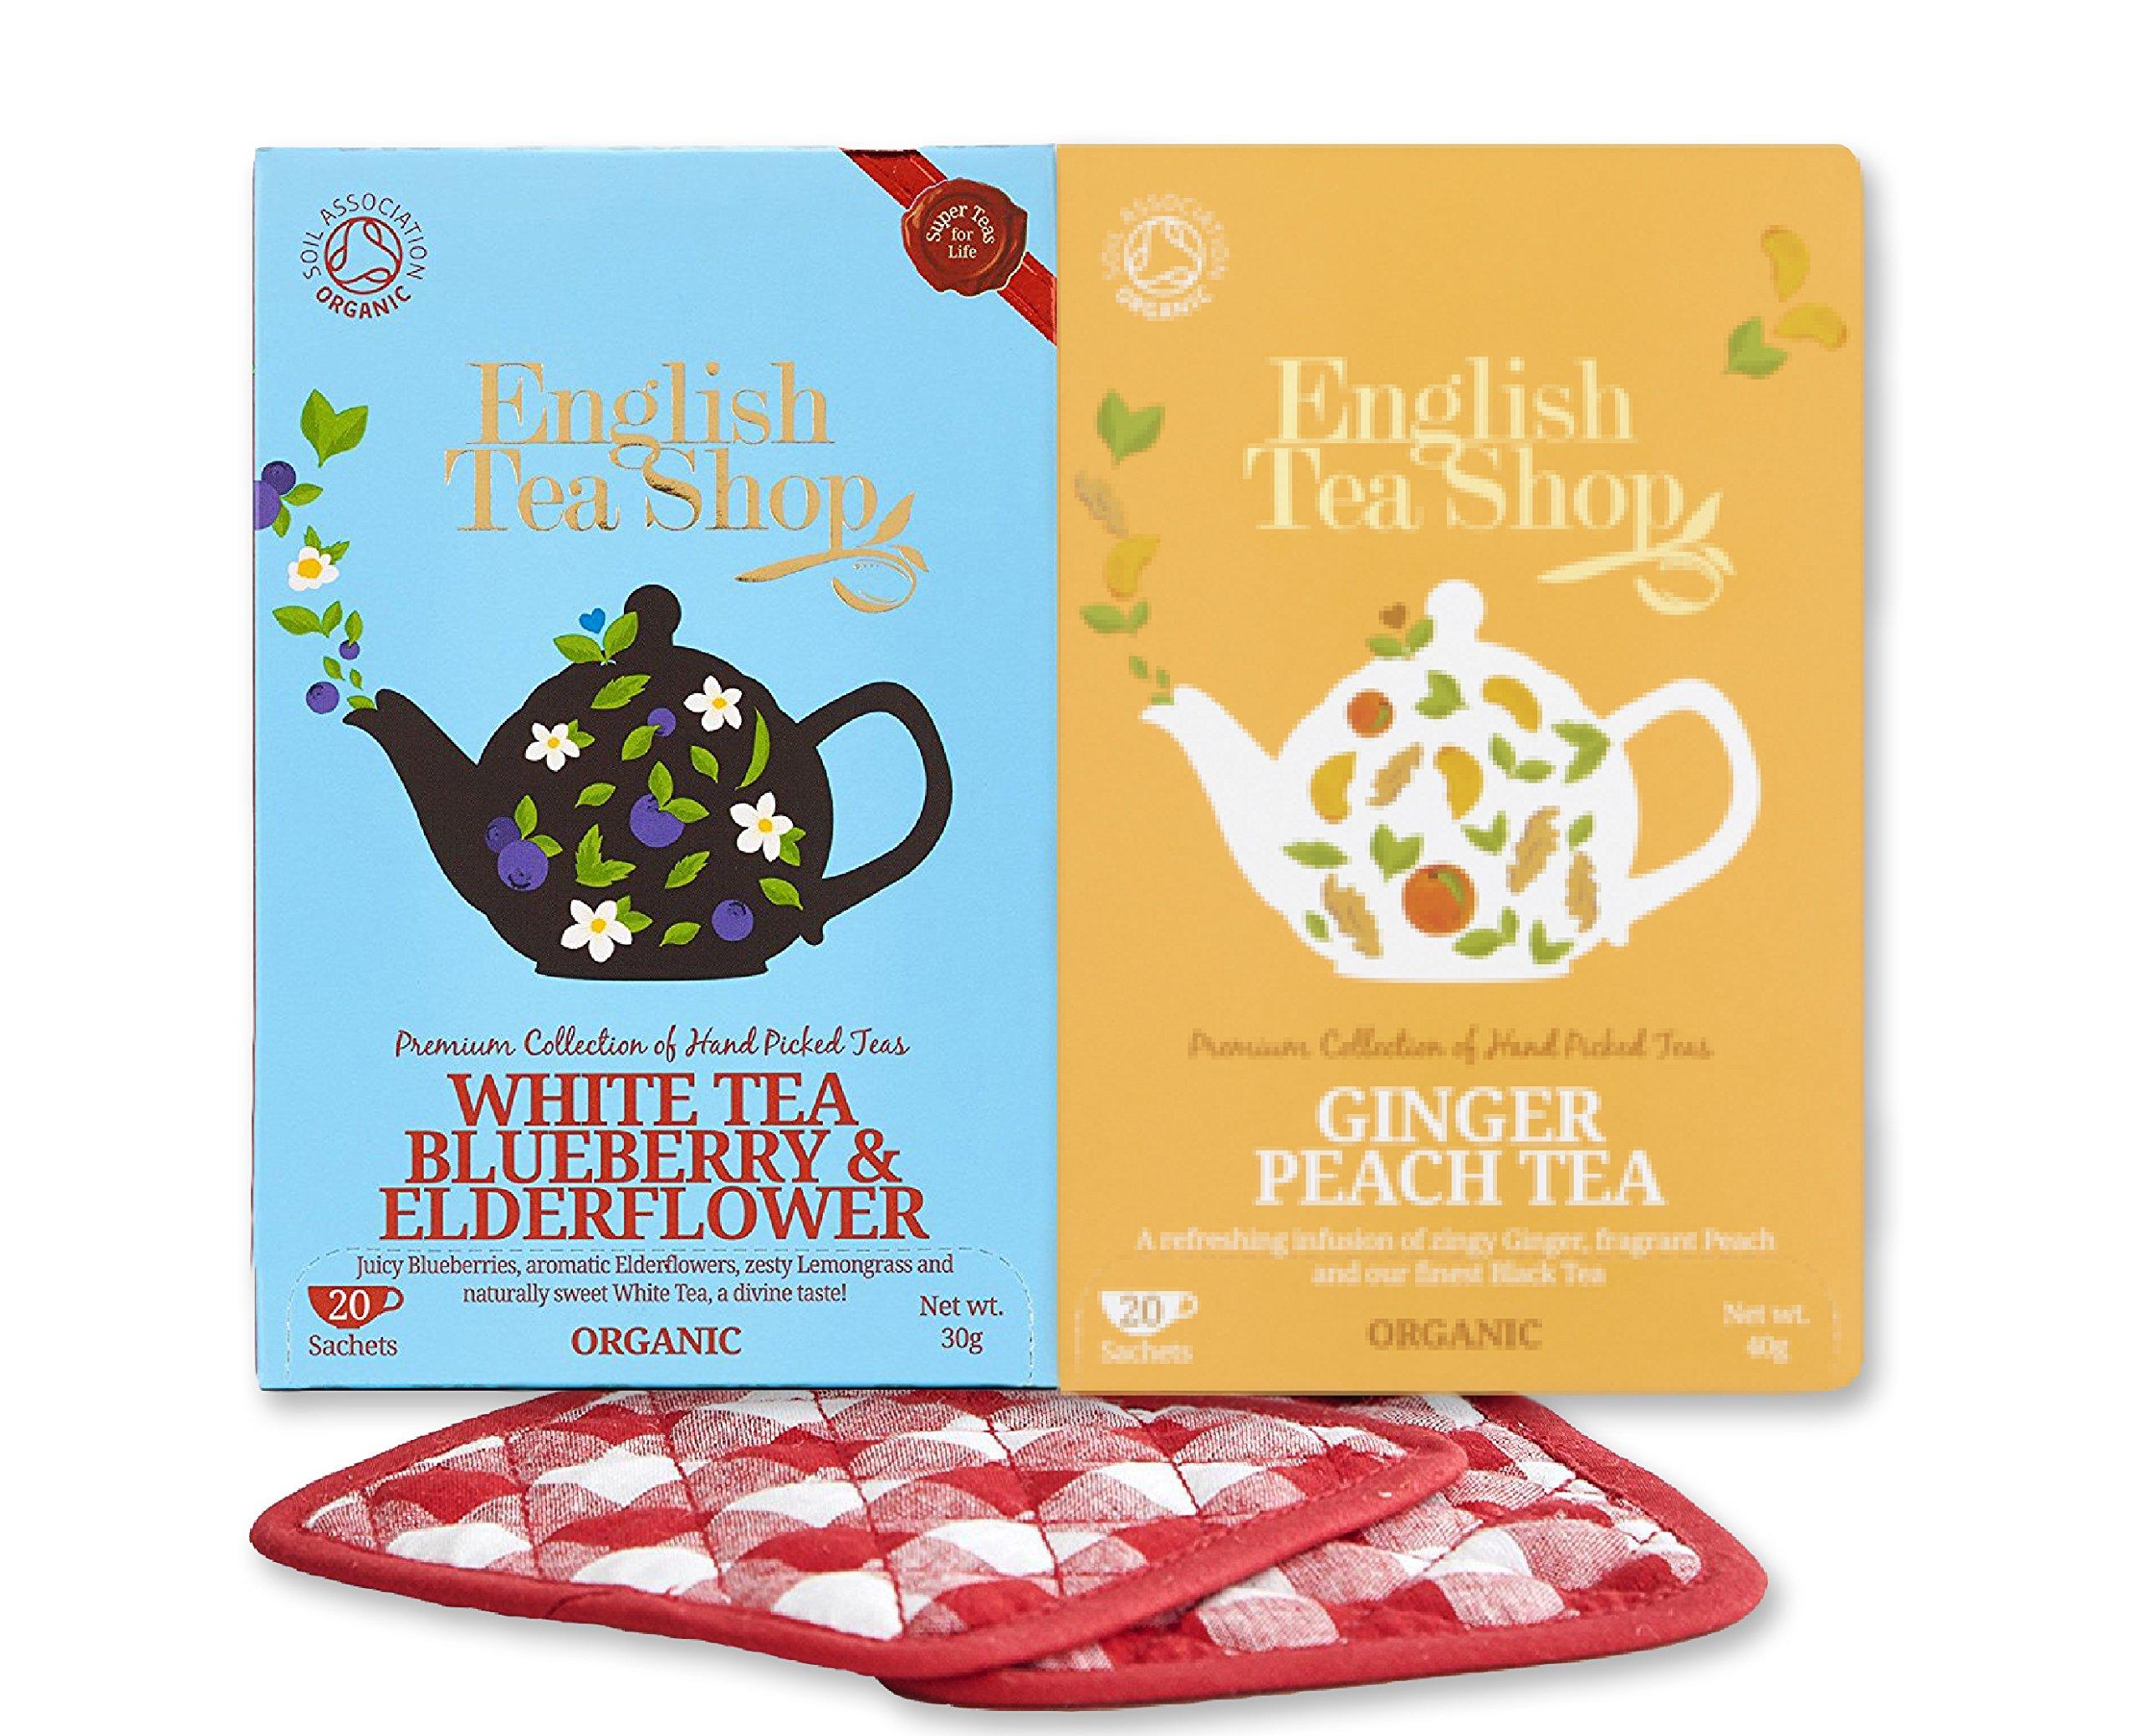 English Tea Shop Bundle White Tea Blueberry and Elderflower 20 Tea Bags Ginger Peach Tea Organic 20 Tea Bags with Set of Basically British Tea Coasters